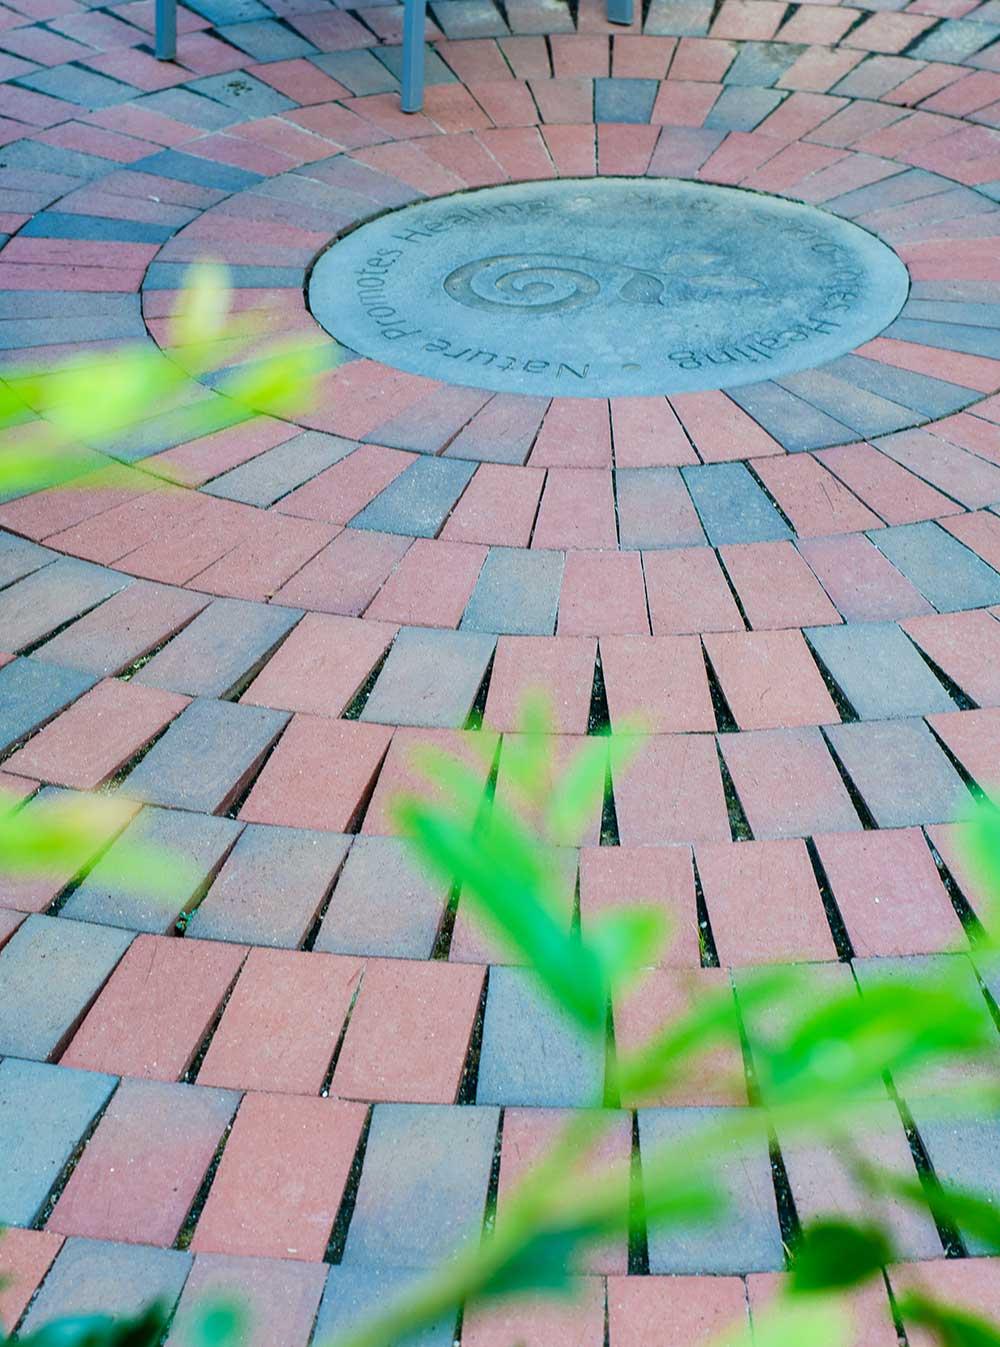 clay-pavers-in-circular-patio-in-healing-garden